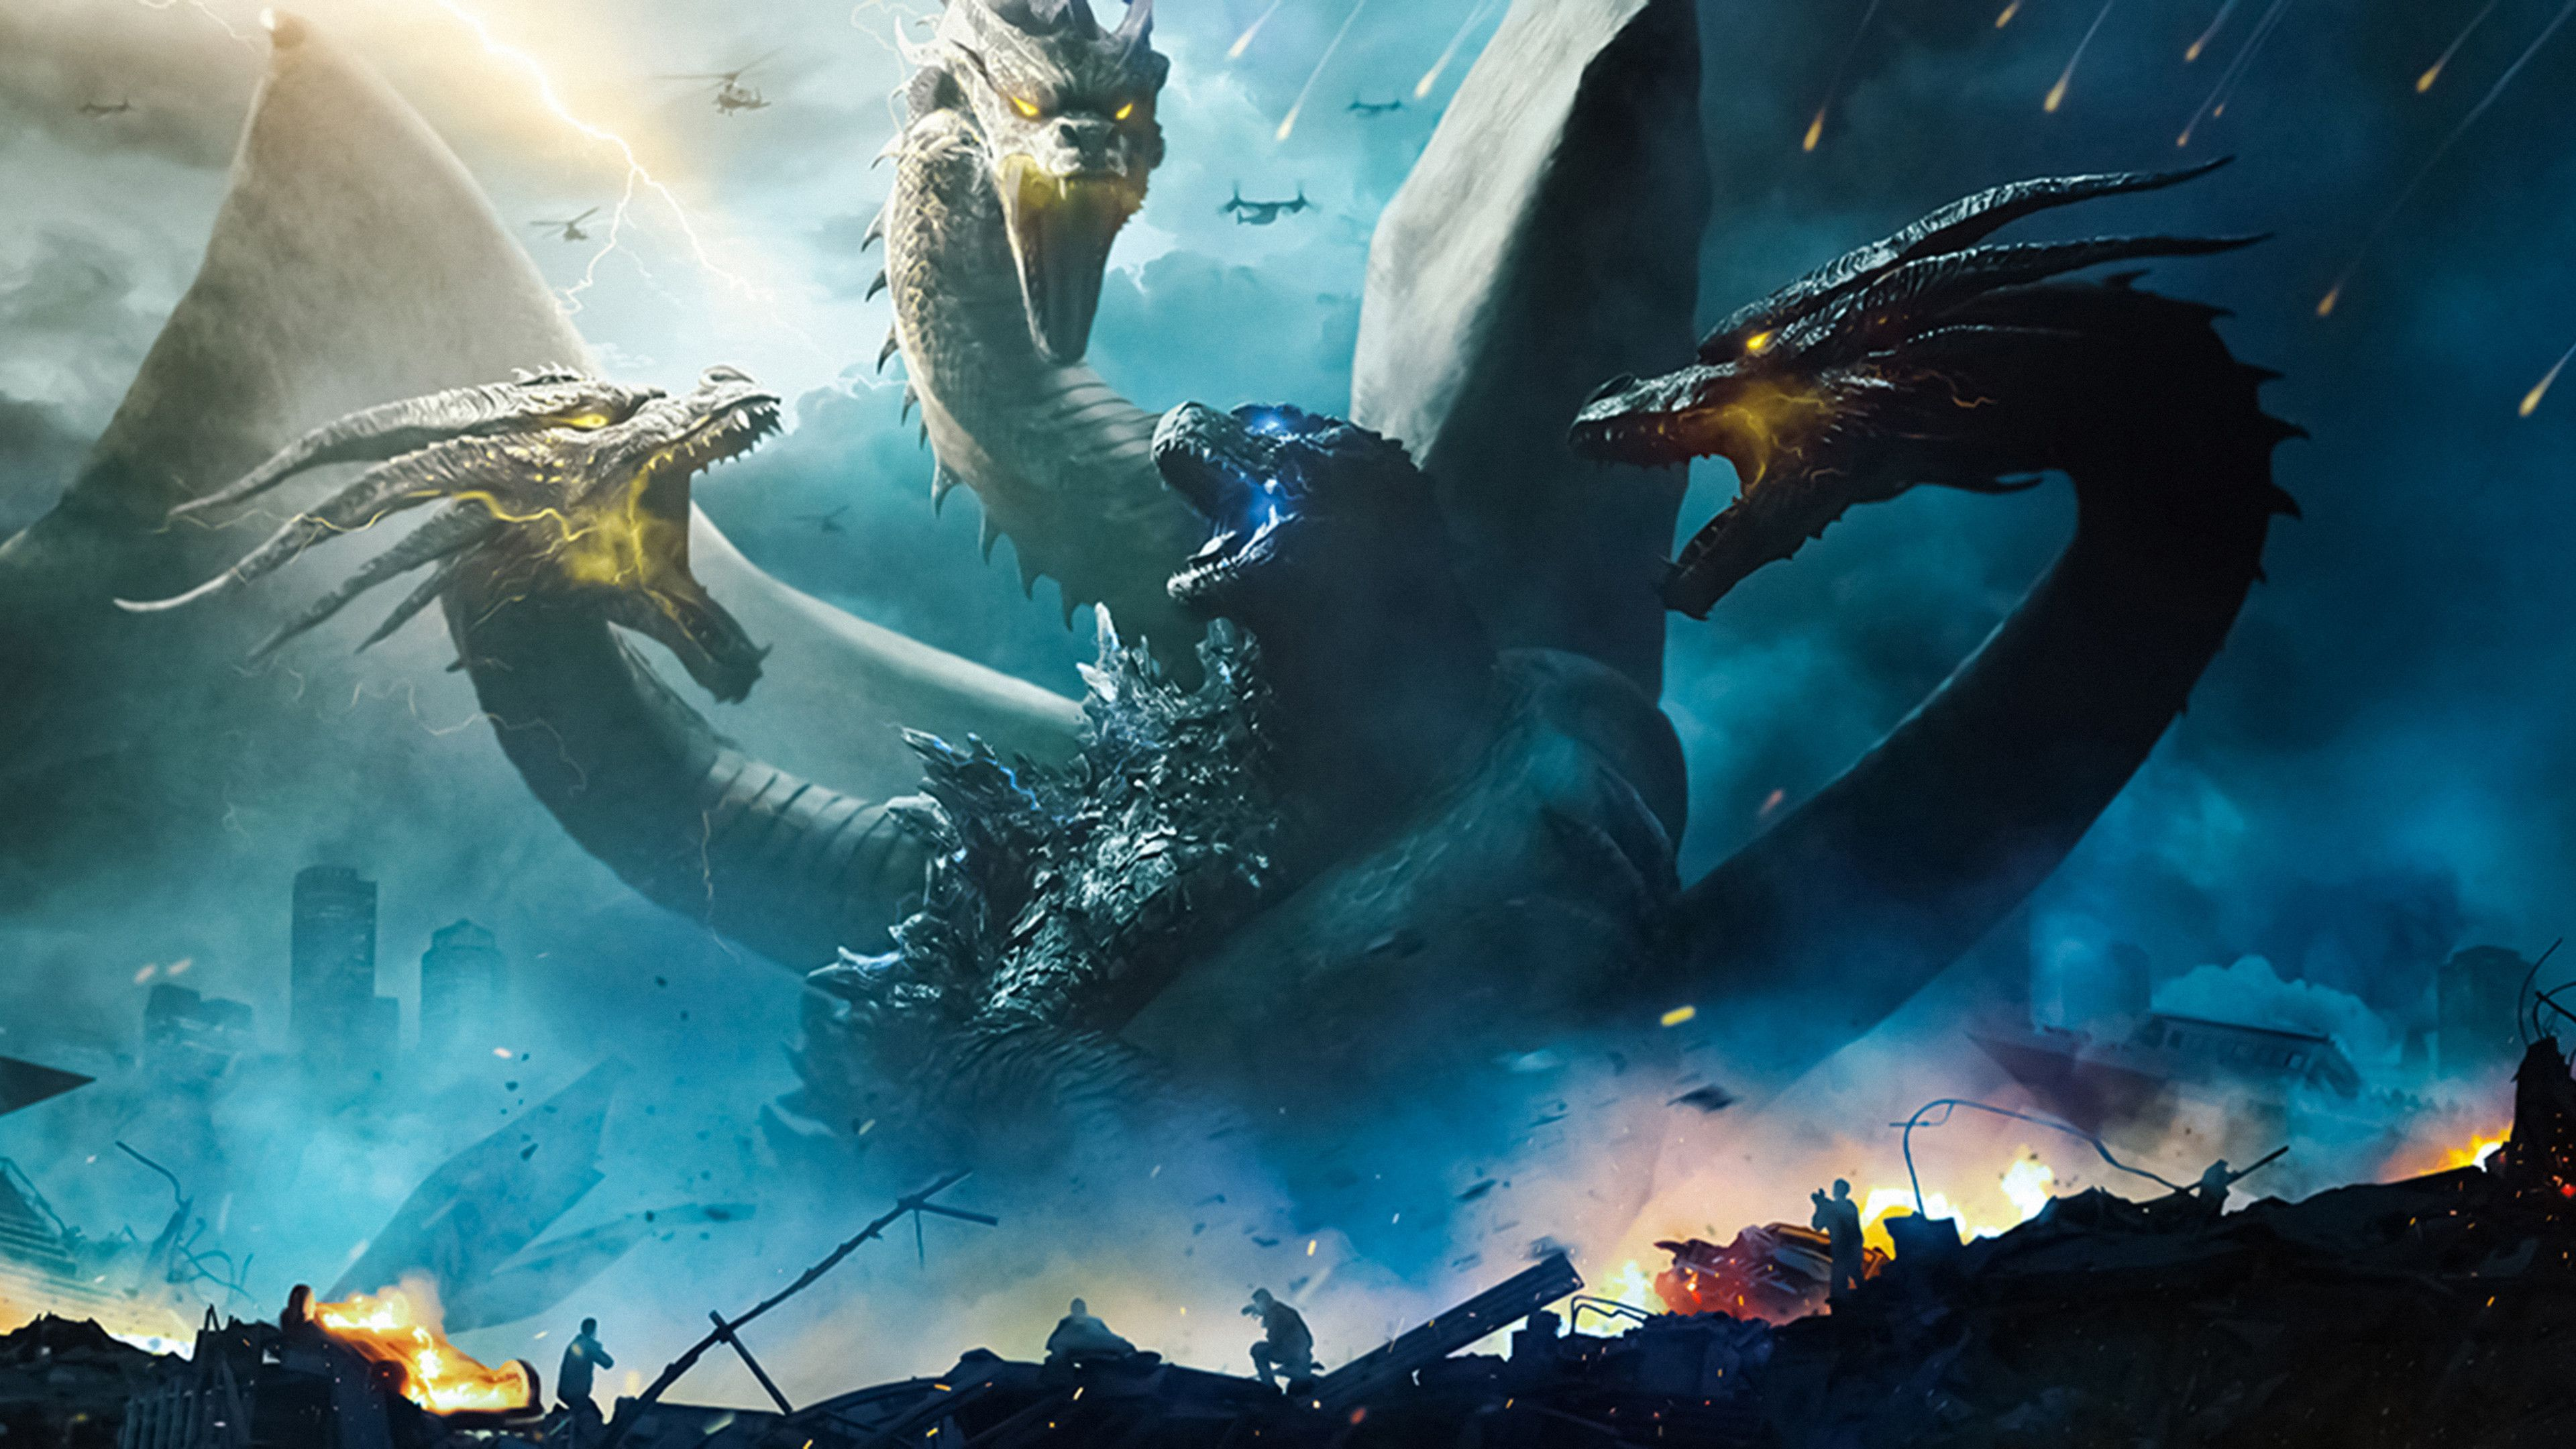 Godzilla Vs King Ghidorah Wallpapers Top Free Godzilla Vs King